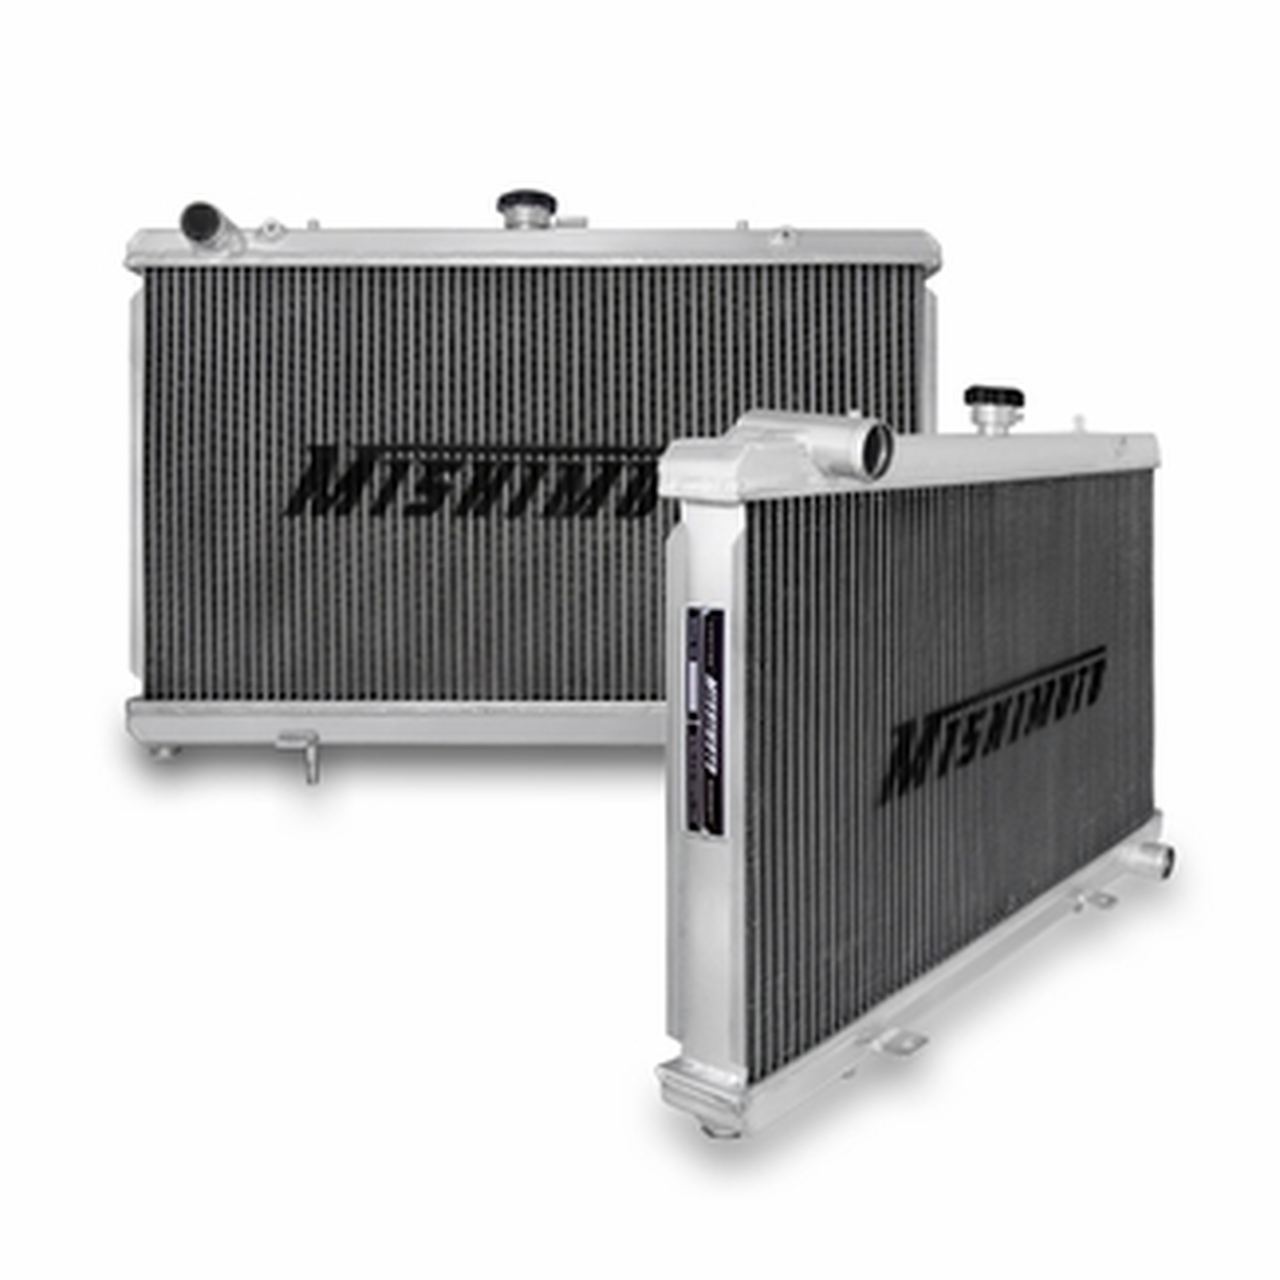 Mishimoto X-Line 3-Row Performance Aluminum Radiator - Nissan SR20DET